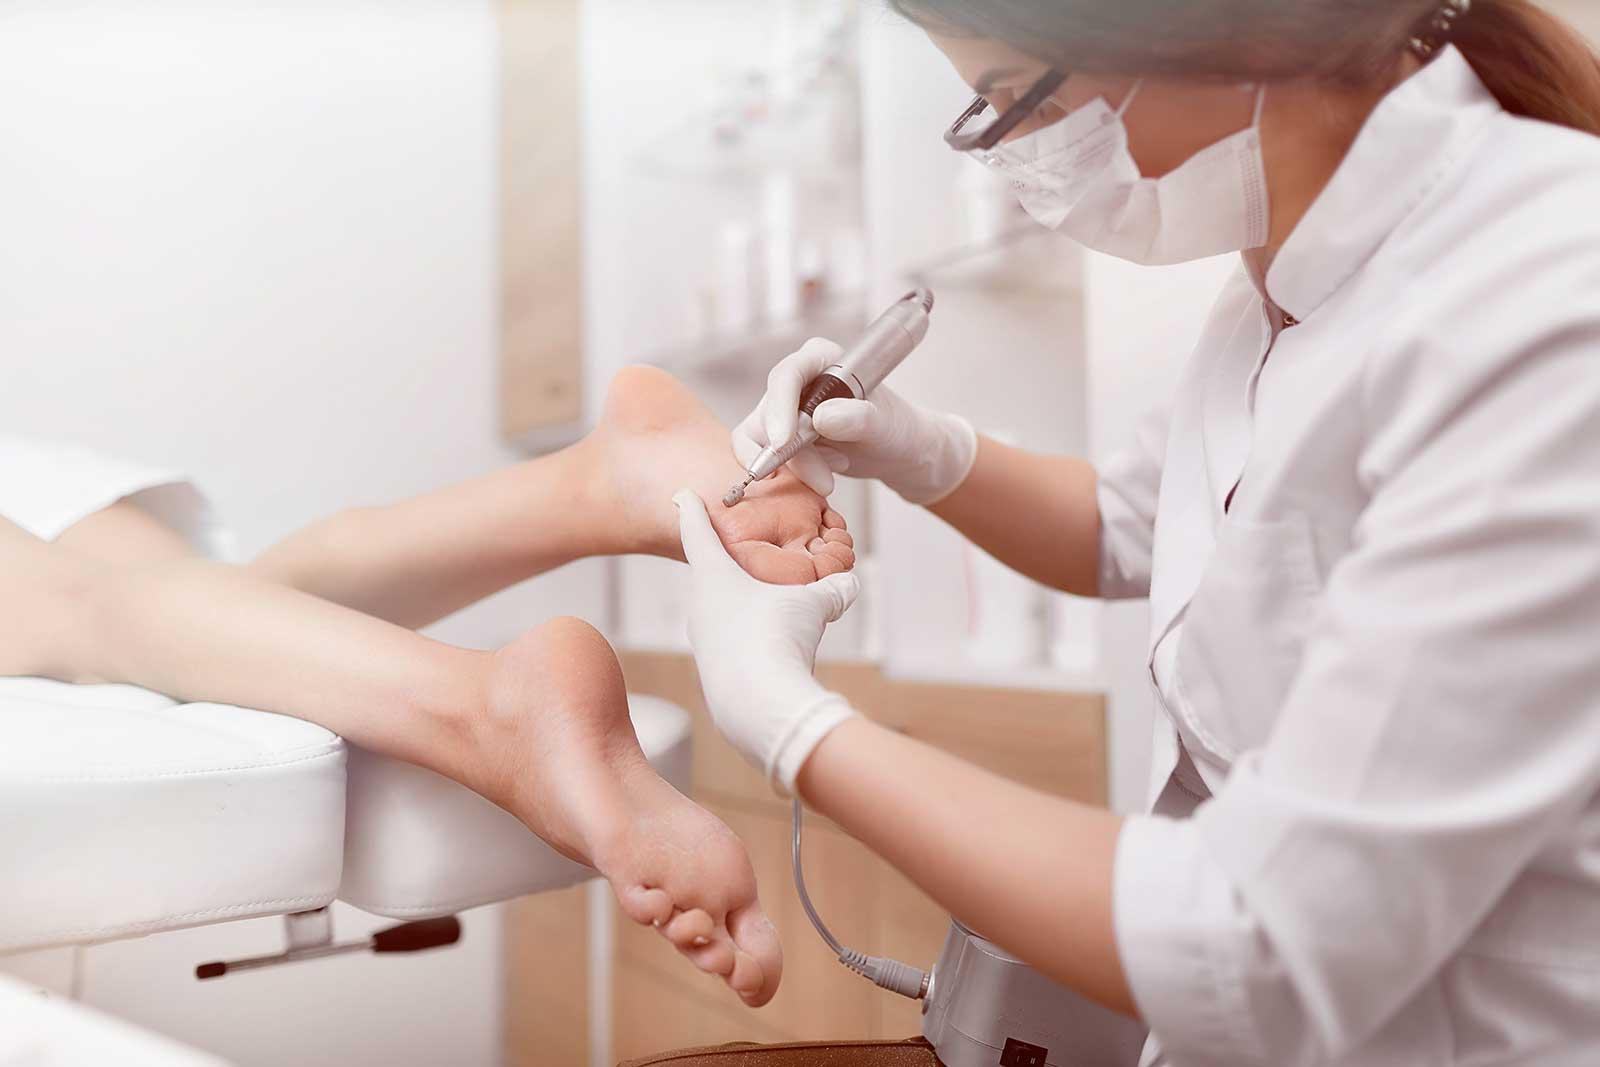 Foot Care and podiatry in Farnham Surrey